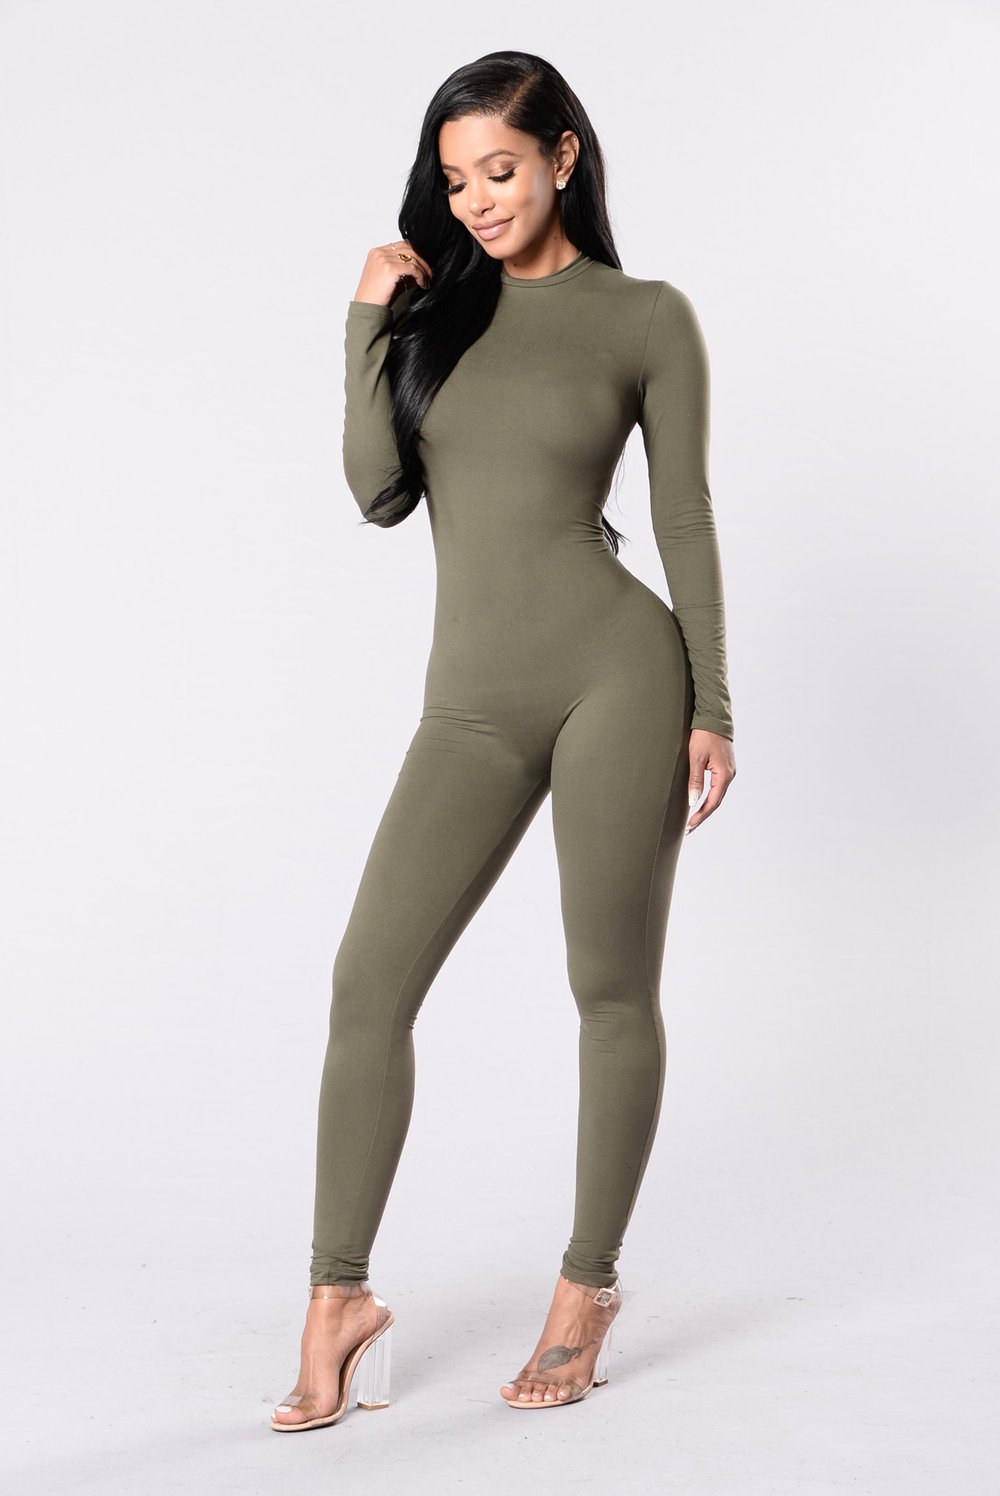 Frisky Feline Jumpsuit - Olive